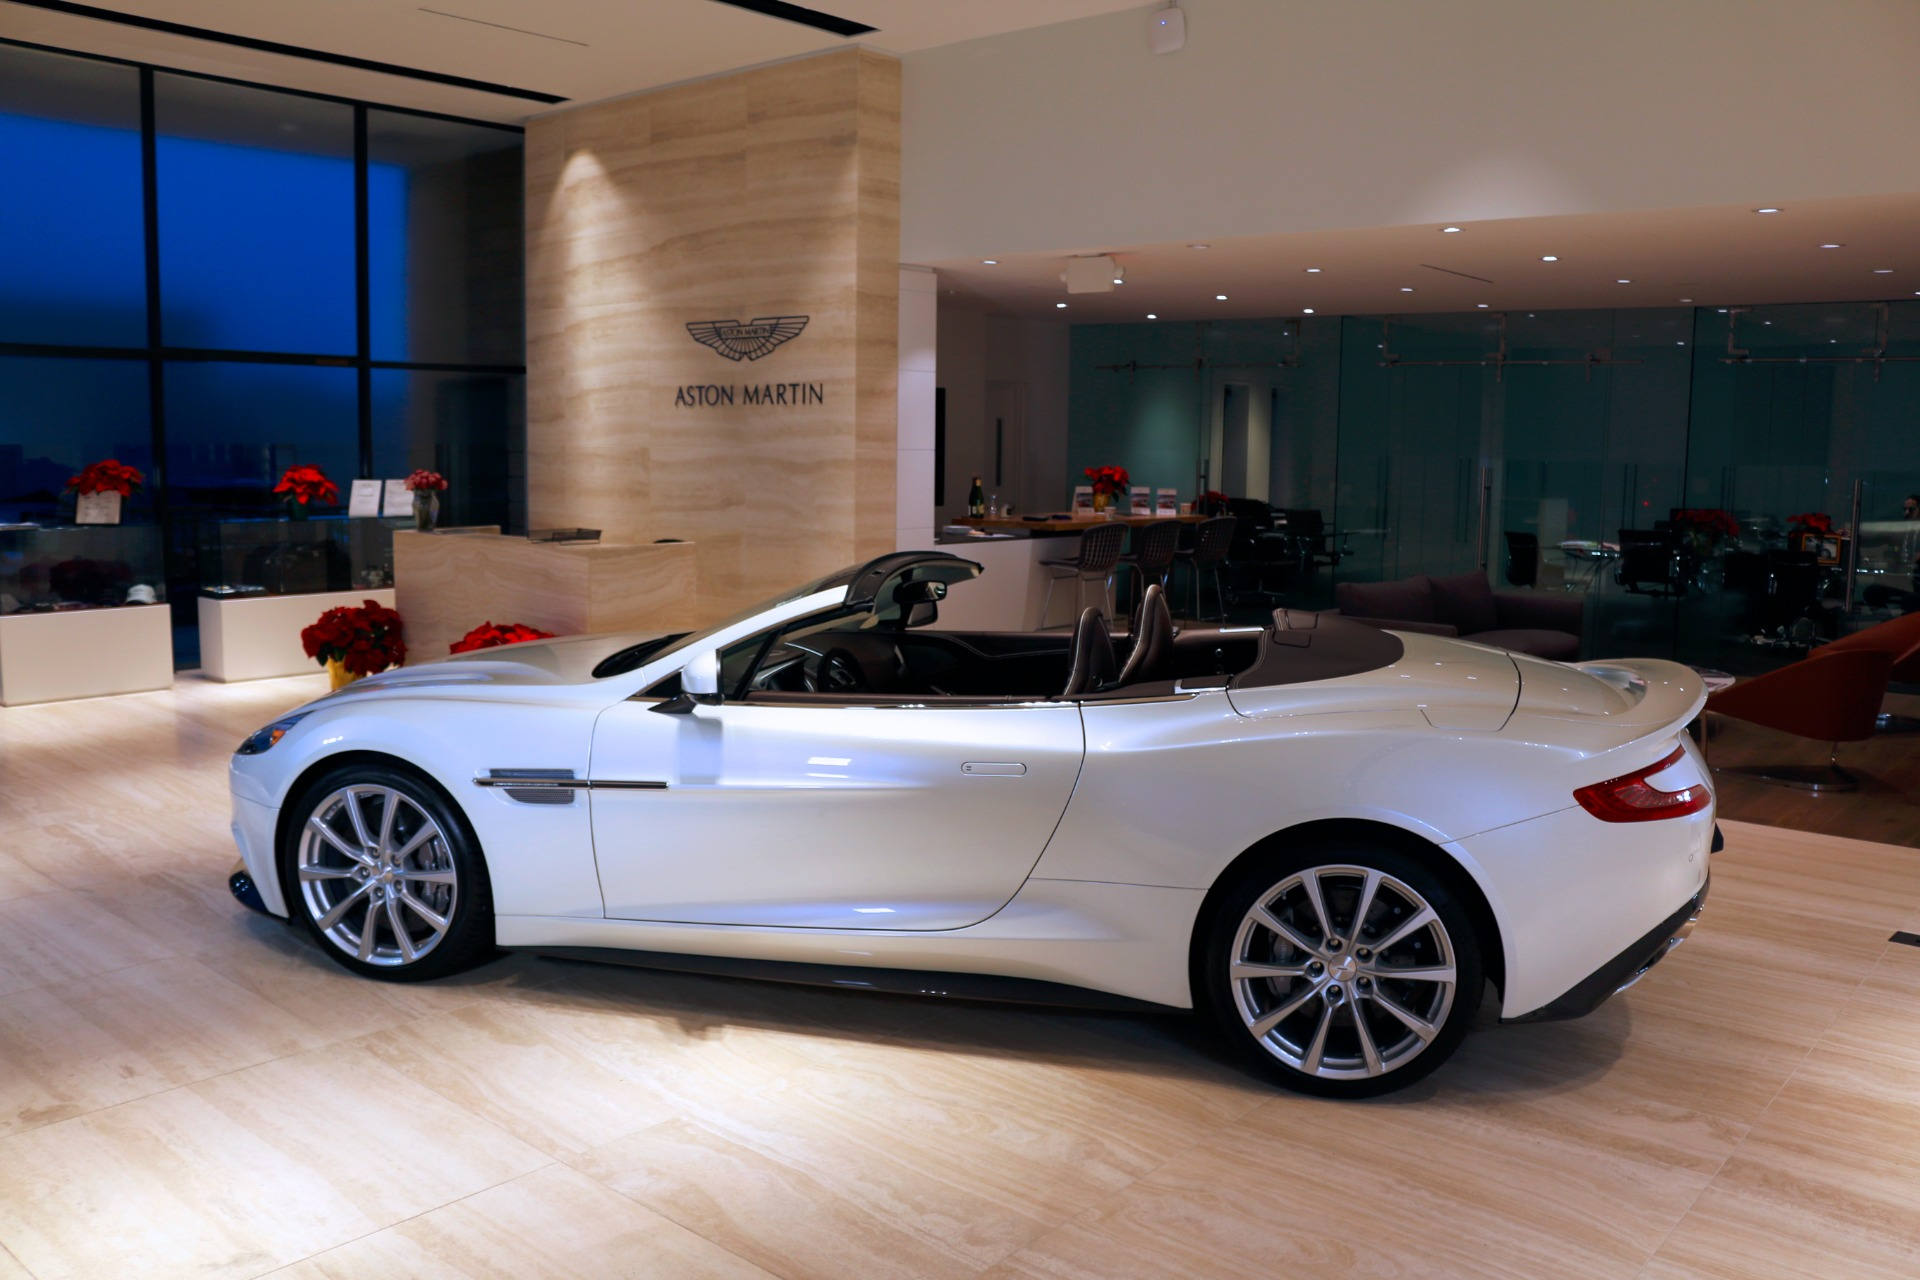 2016 Aston Martin Vanquish Volante Stock 6k02880 For Sale Near Vienna Va Va Aston Martin Dealer